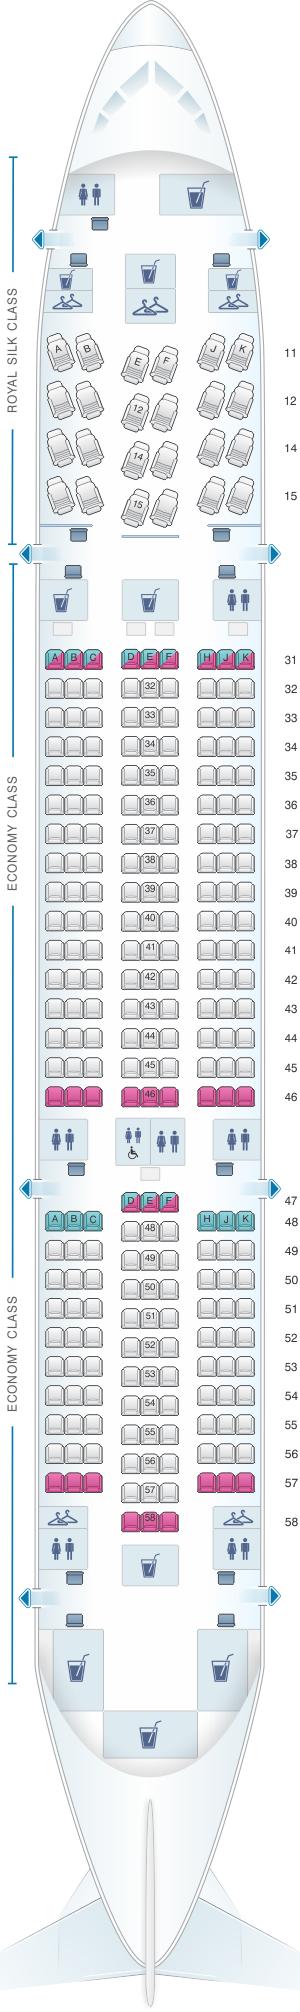 Seat map for Thai Airways International Boeing B787 8